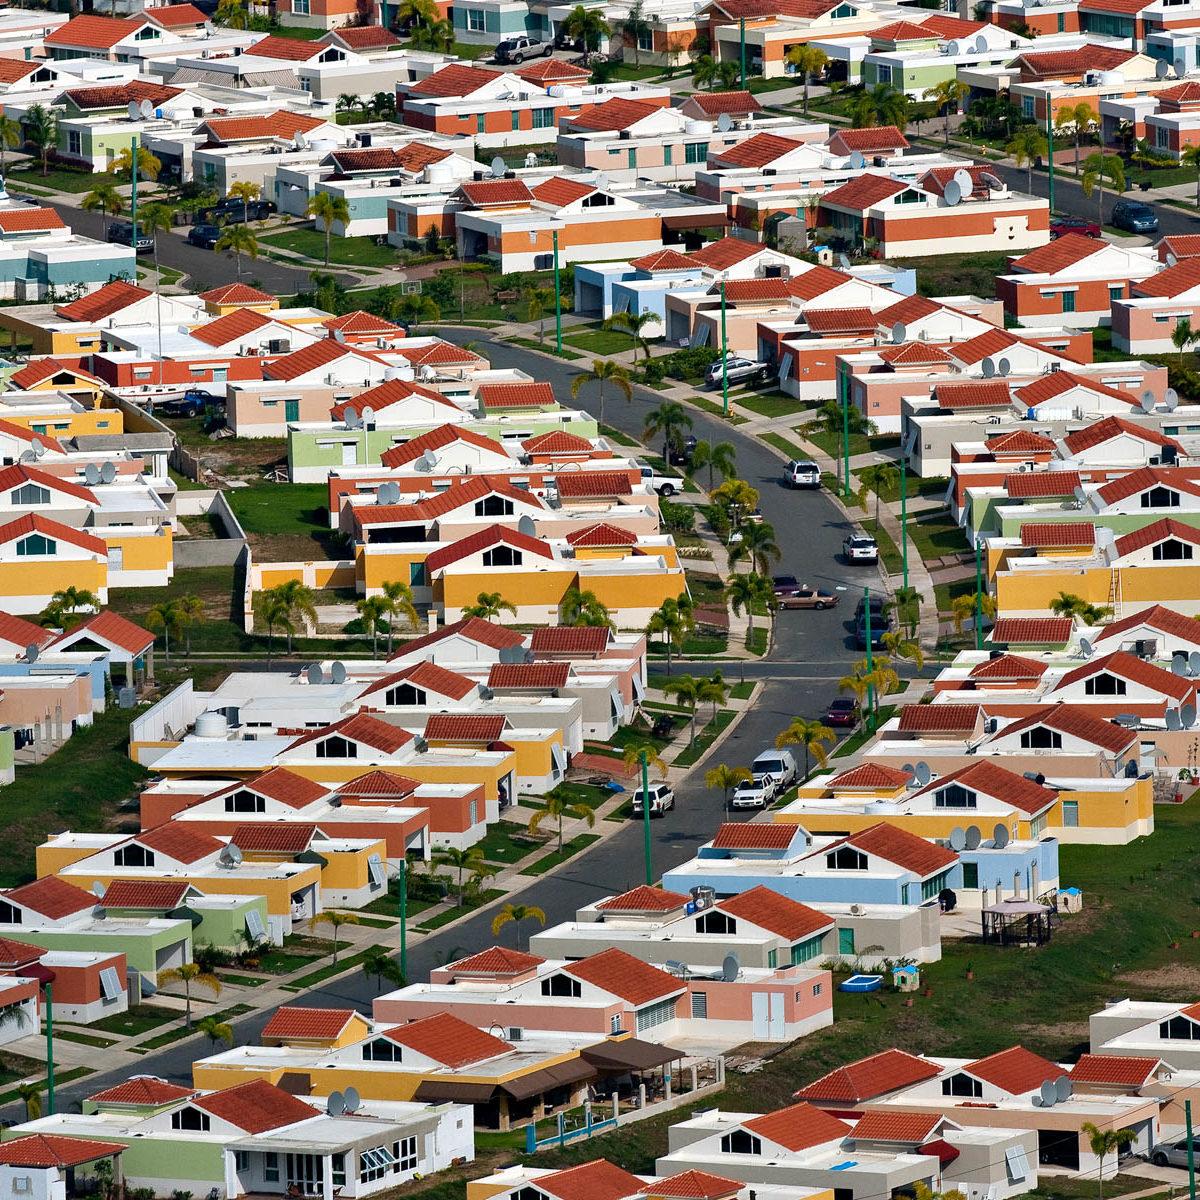 Quartier résidentiel dans la banlieue de Caguas, Porto Rico. (18°13' N - 66°00' W)